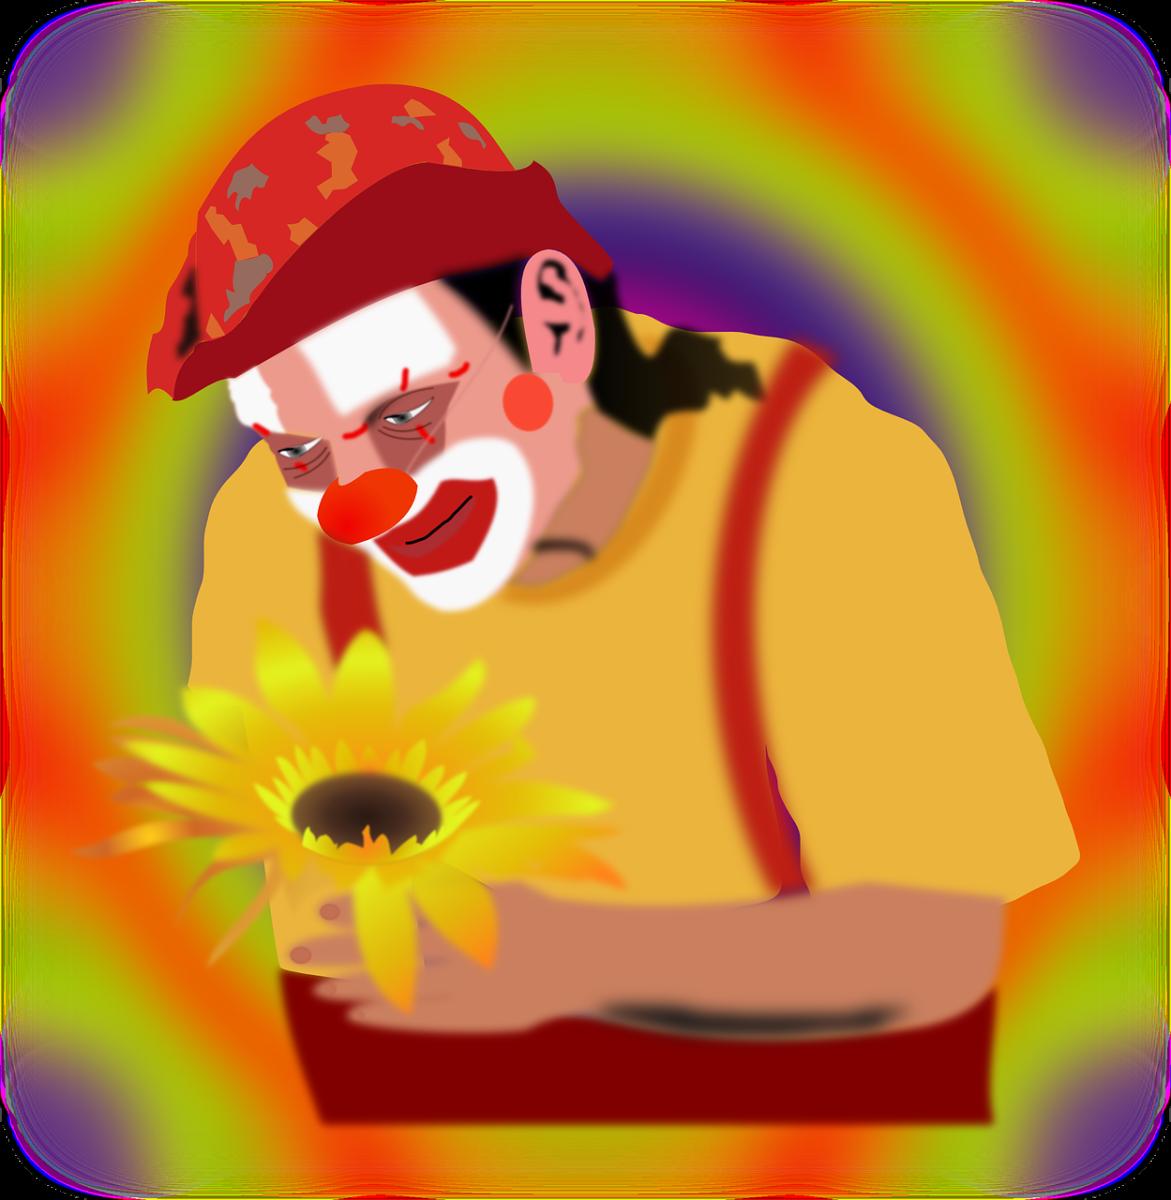 Clown with sunflower